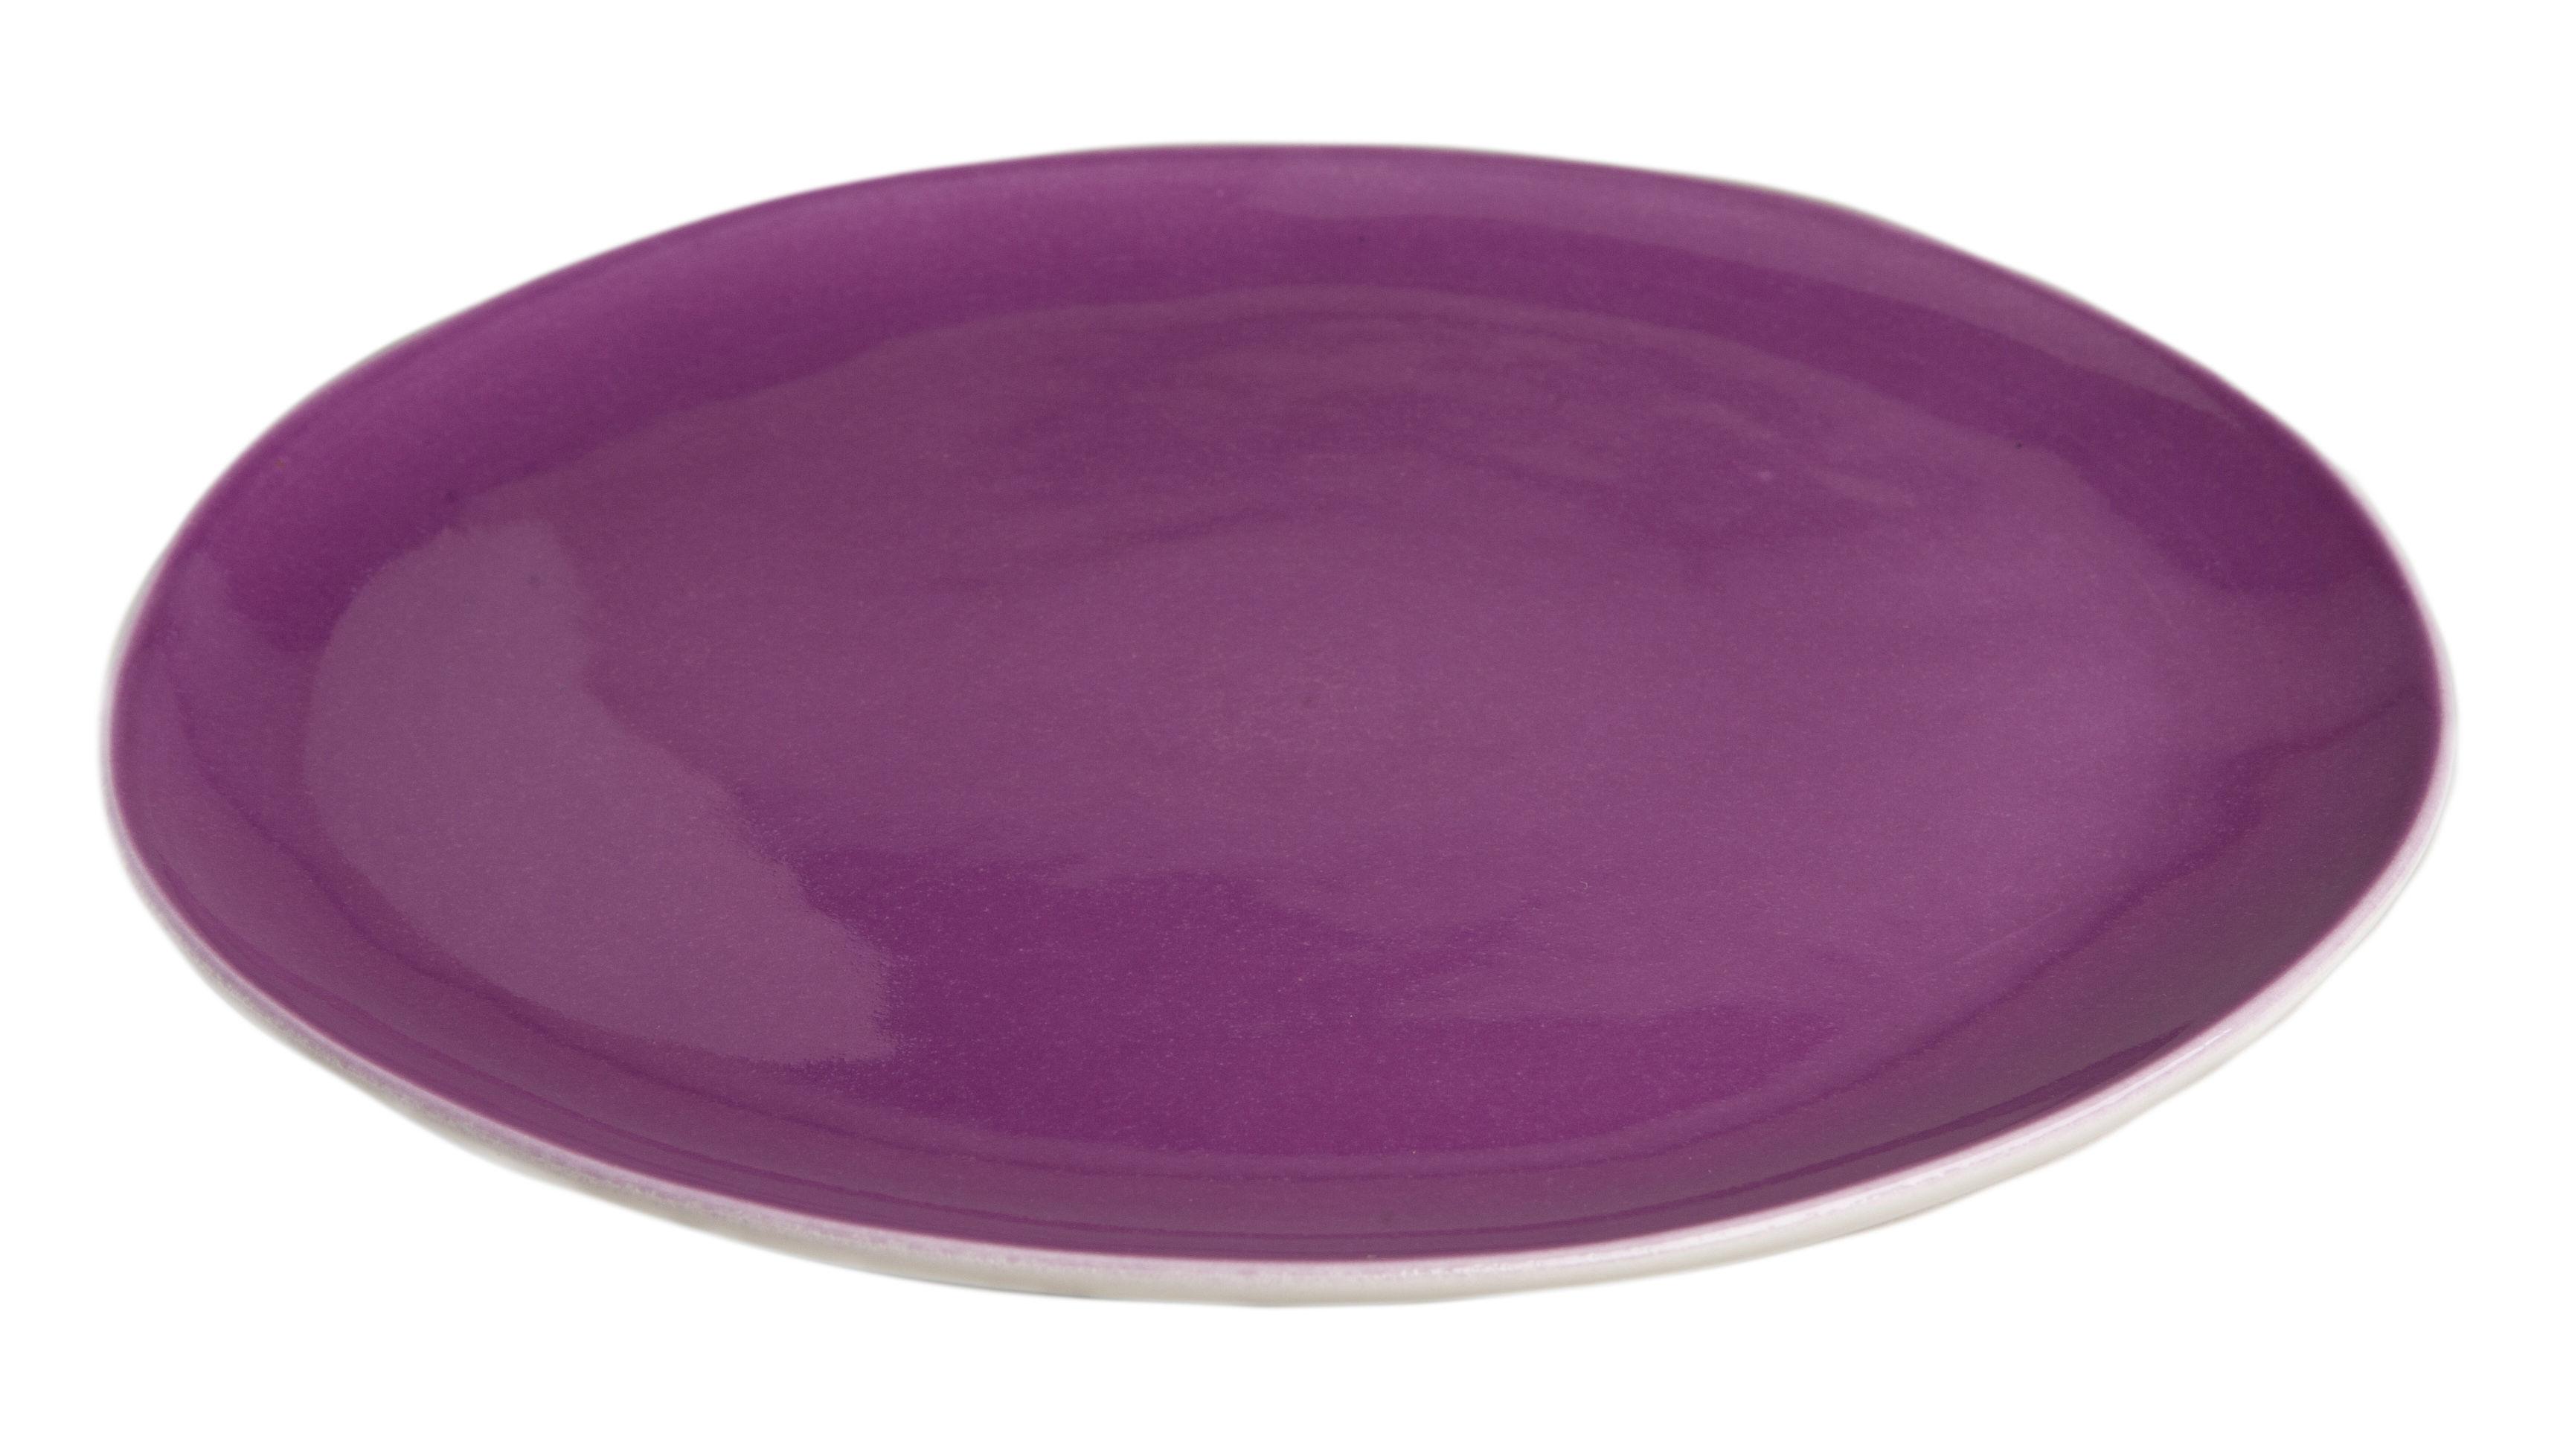 Tableware - Plates - Bazelaire Plate - Ø 26cm by Sentou Edition - Purple - Enamelled earthenware